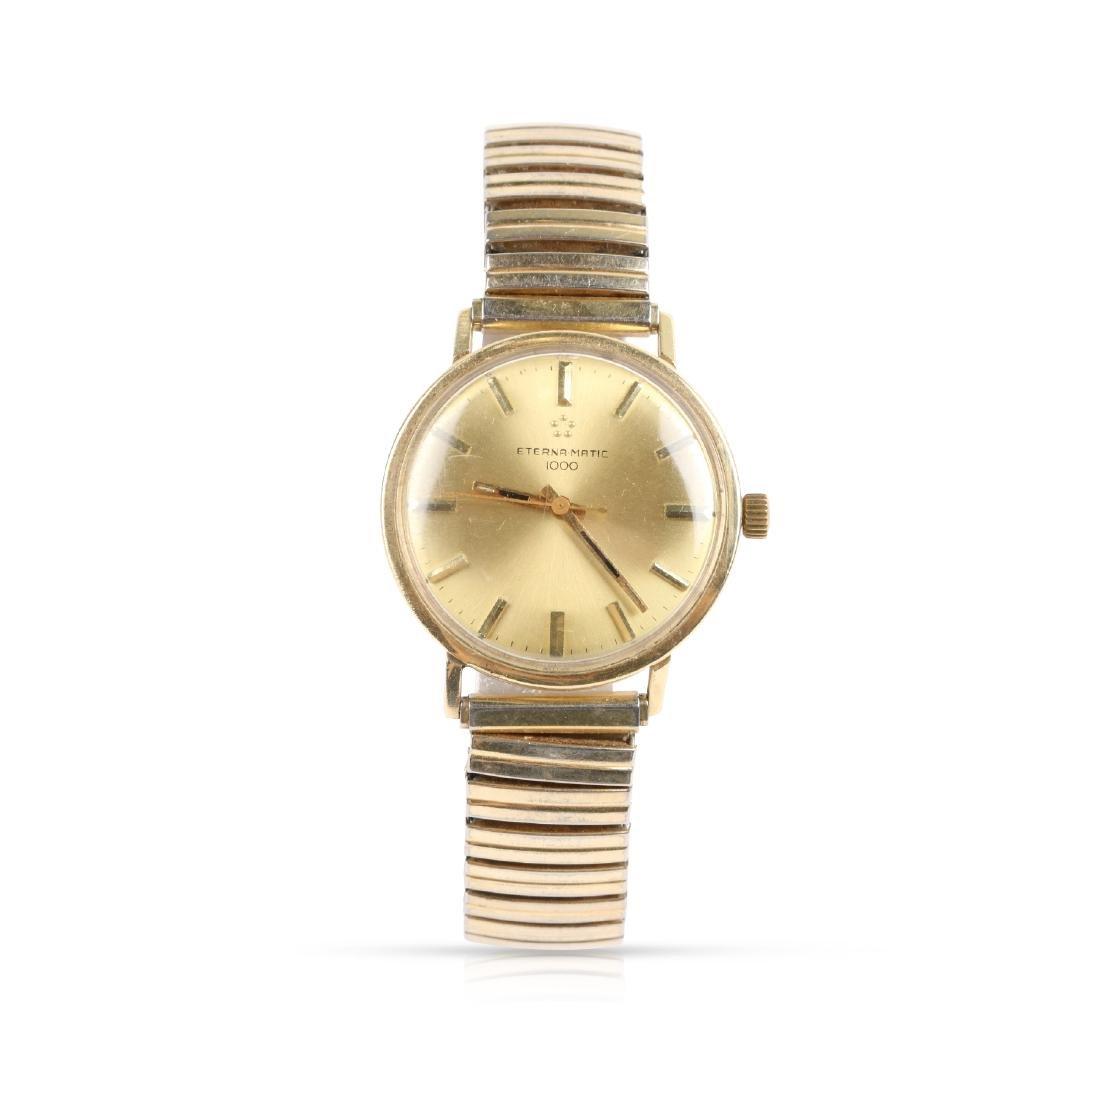 "Eternamatic, 14K ""1000"", Ref. Wristwatch"